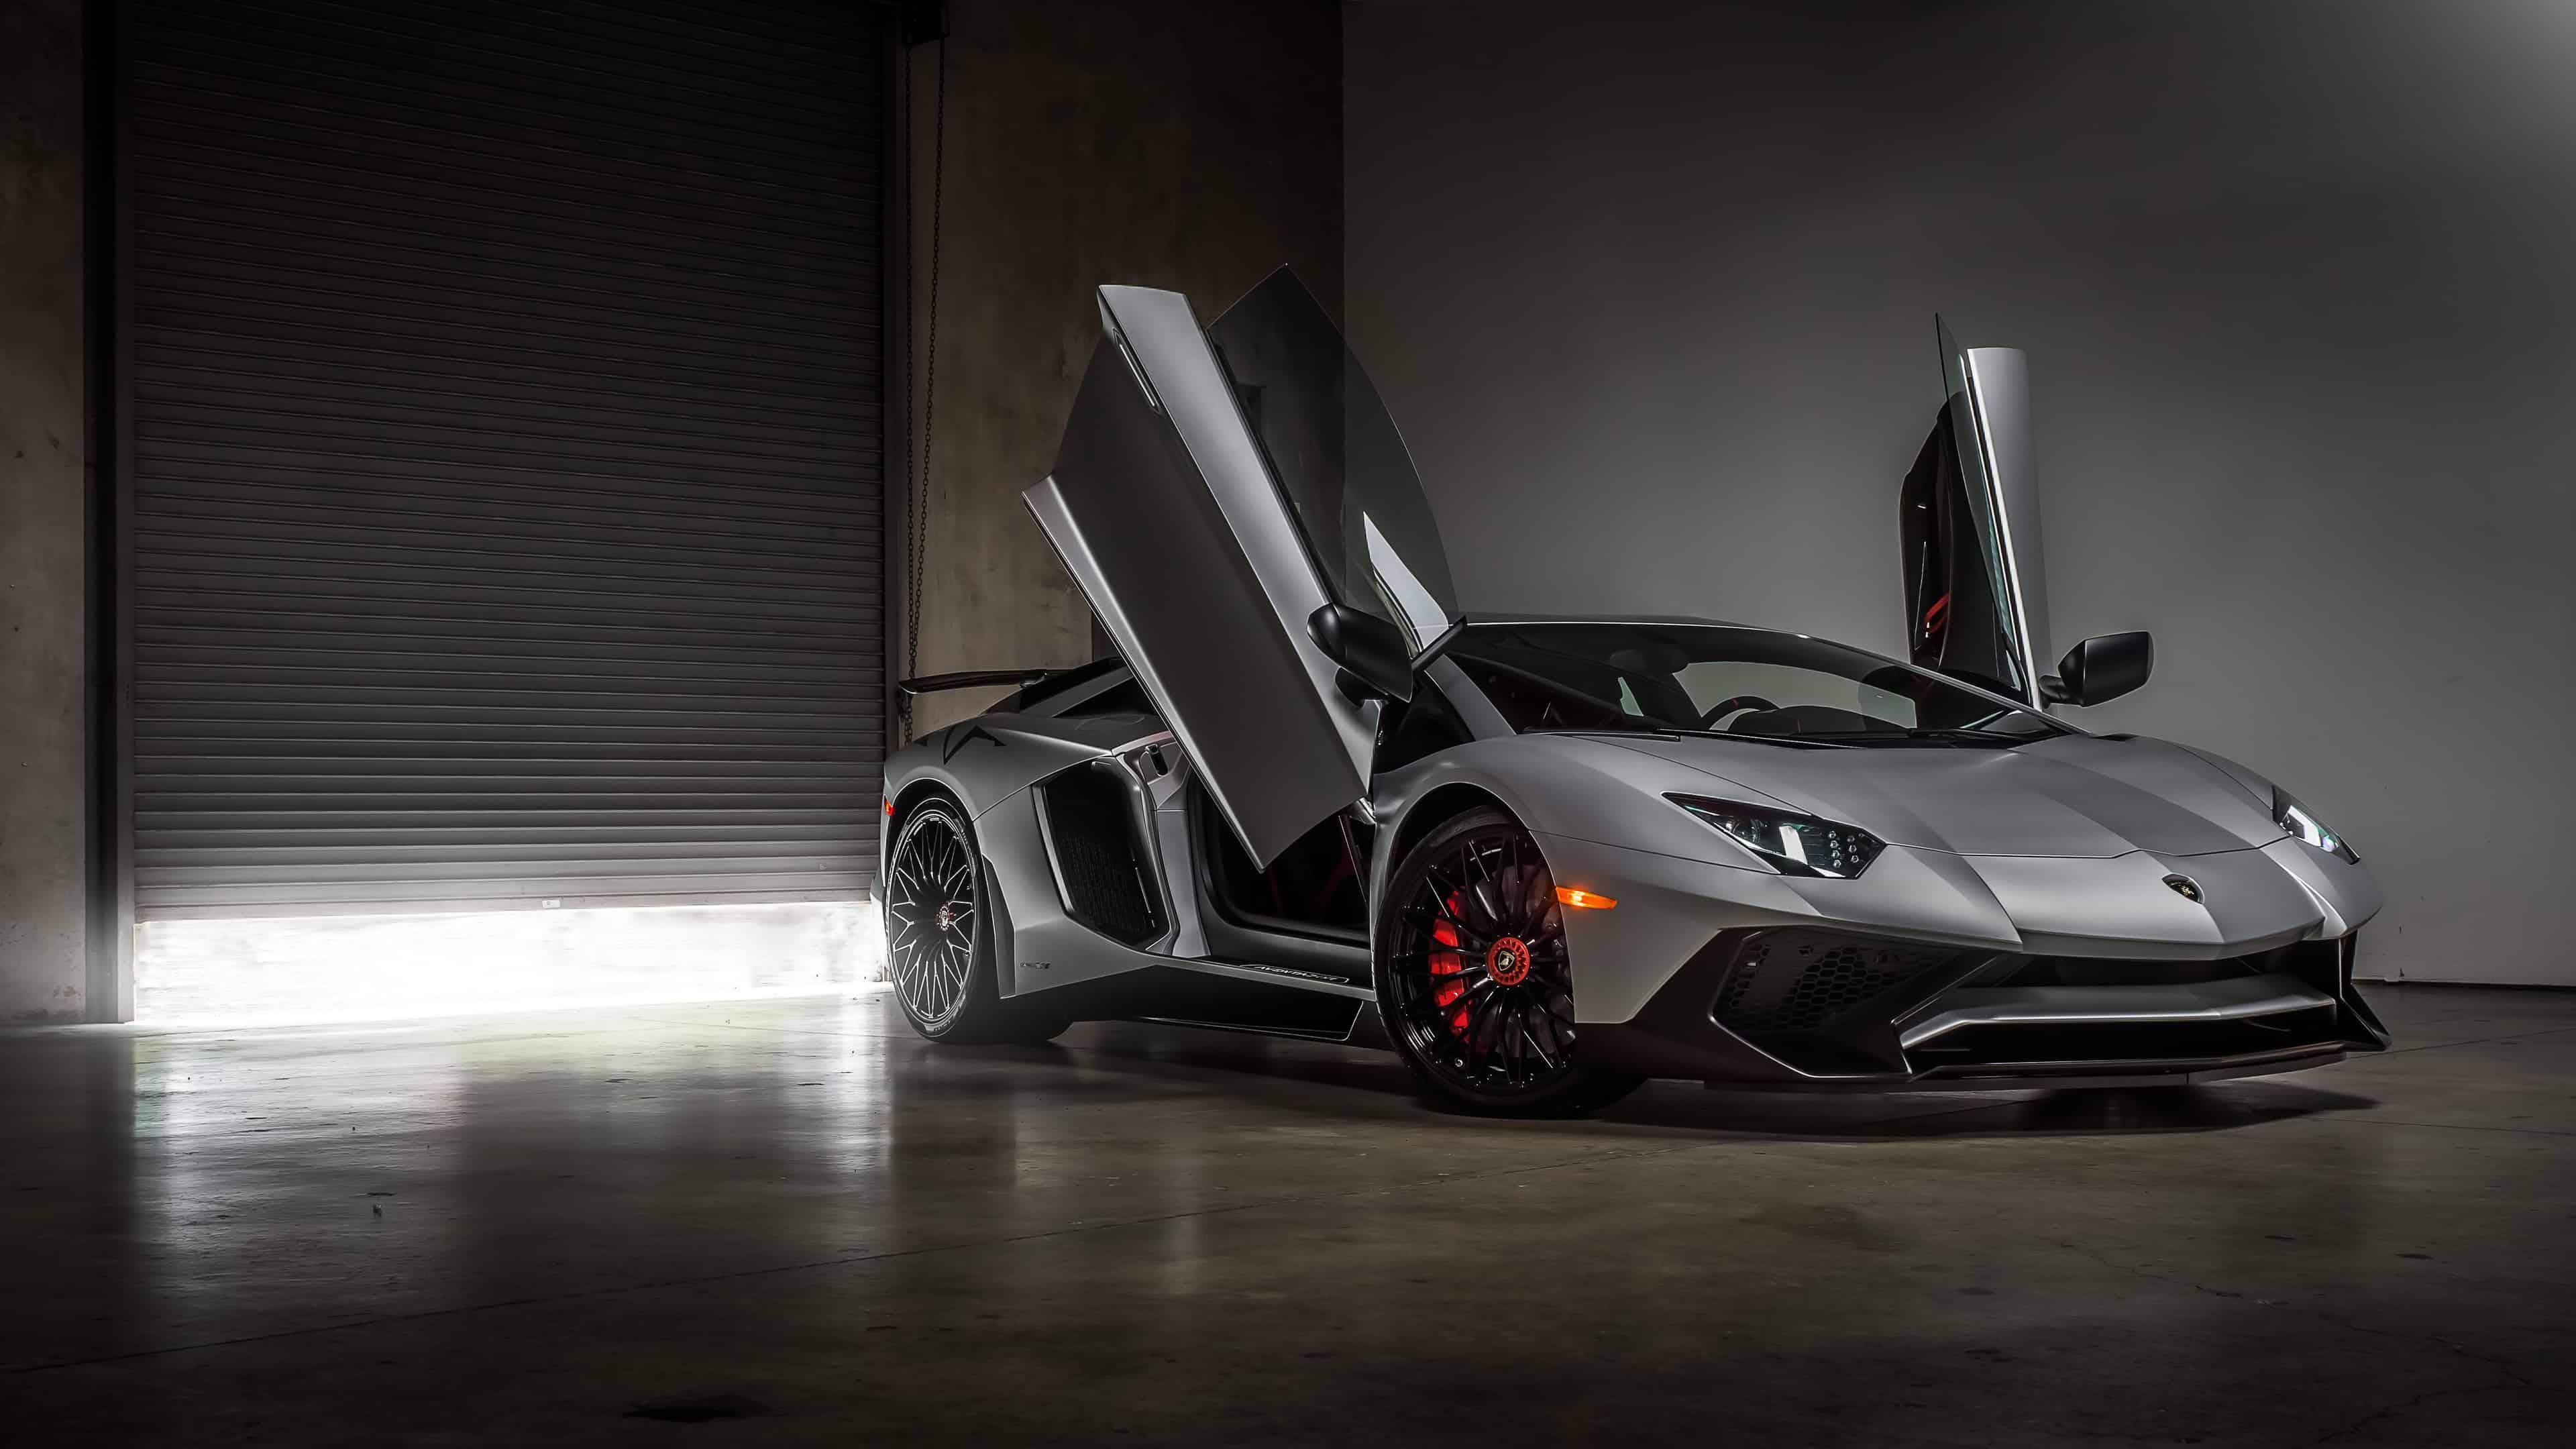 Lamborghini Aventador Lp 750 Superveloce Uhd 4k Wallpaper